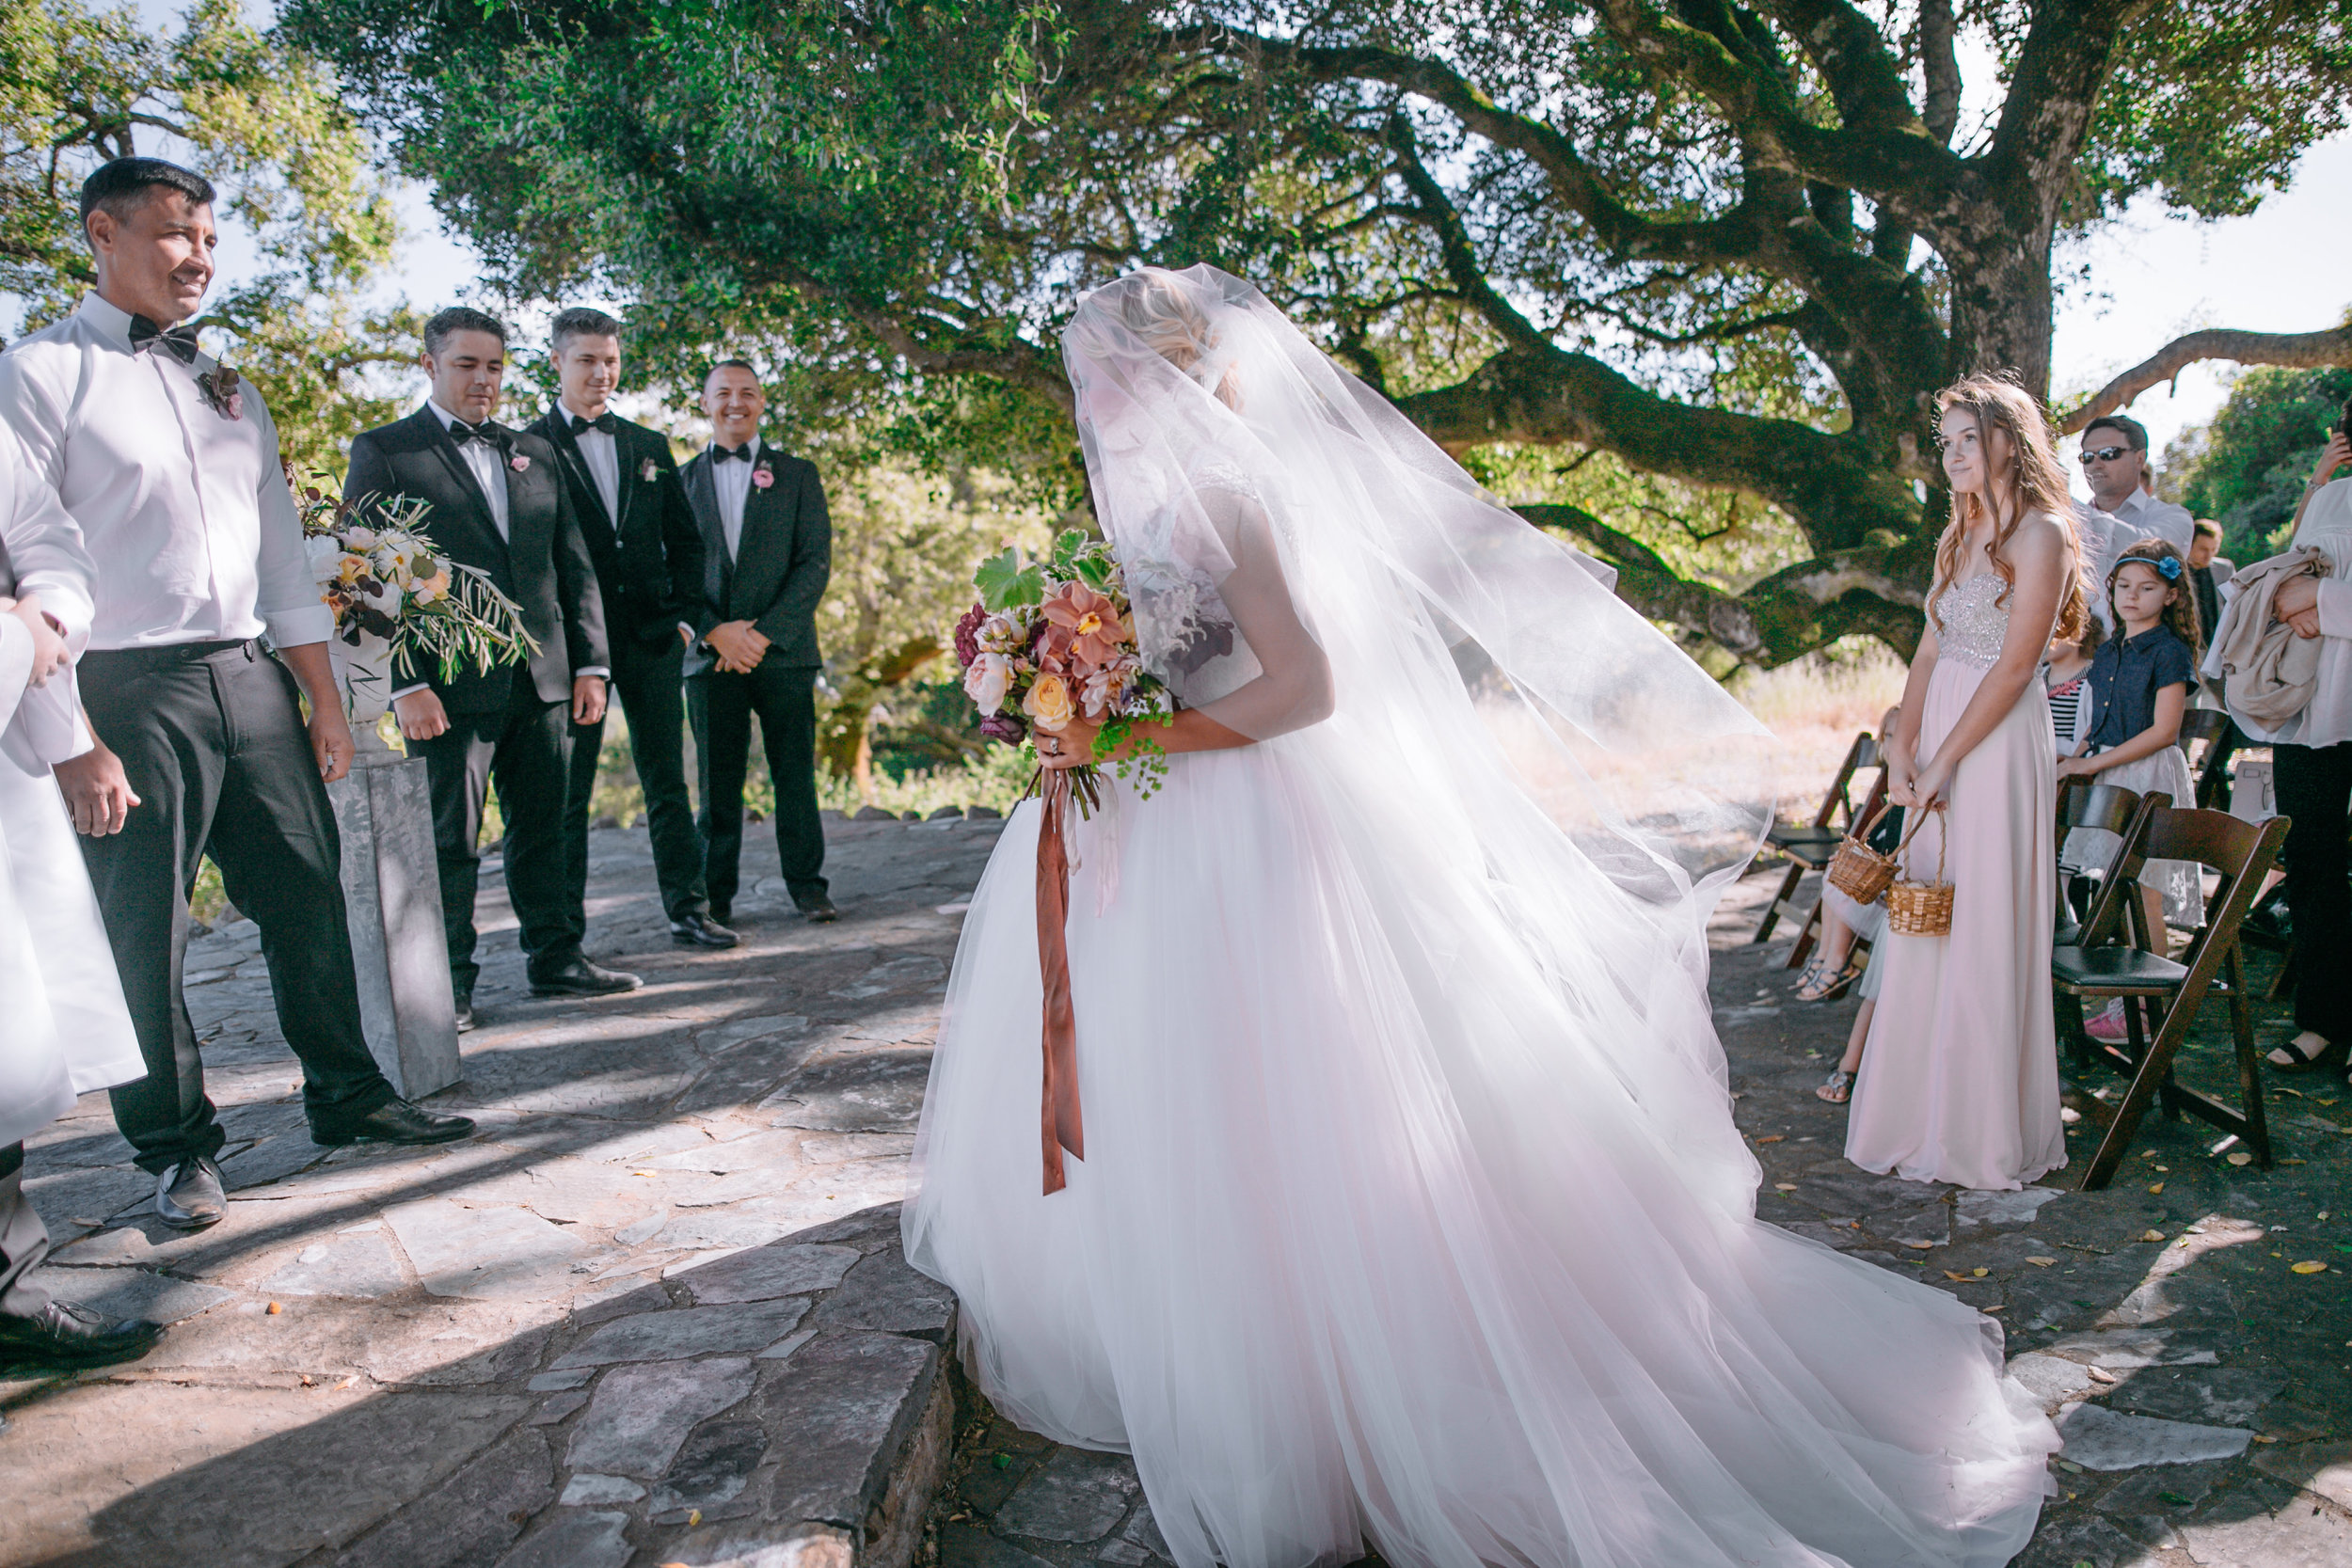 N K wedding-Ceremony-0068.jpg